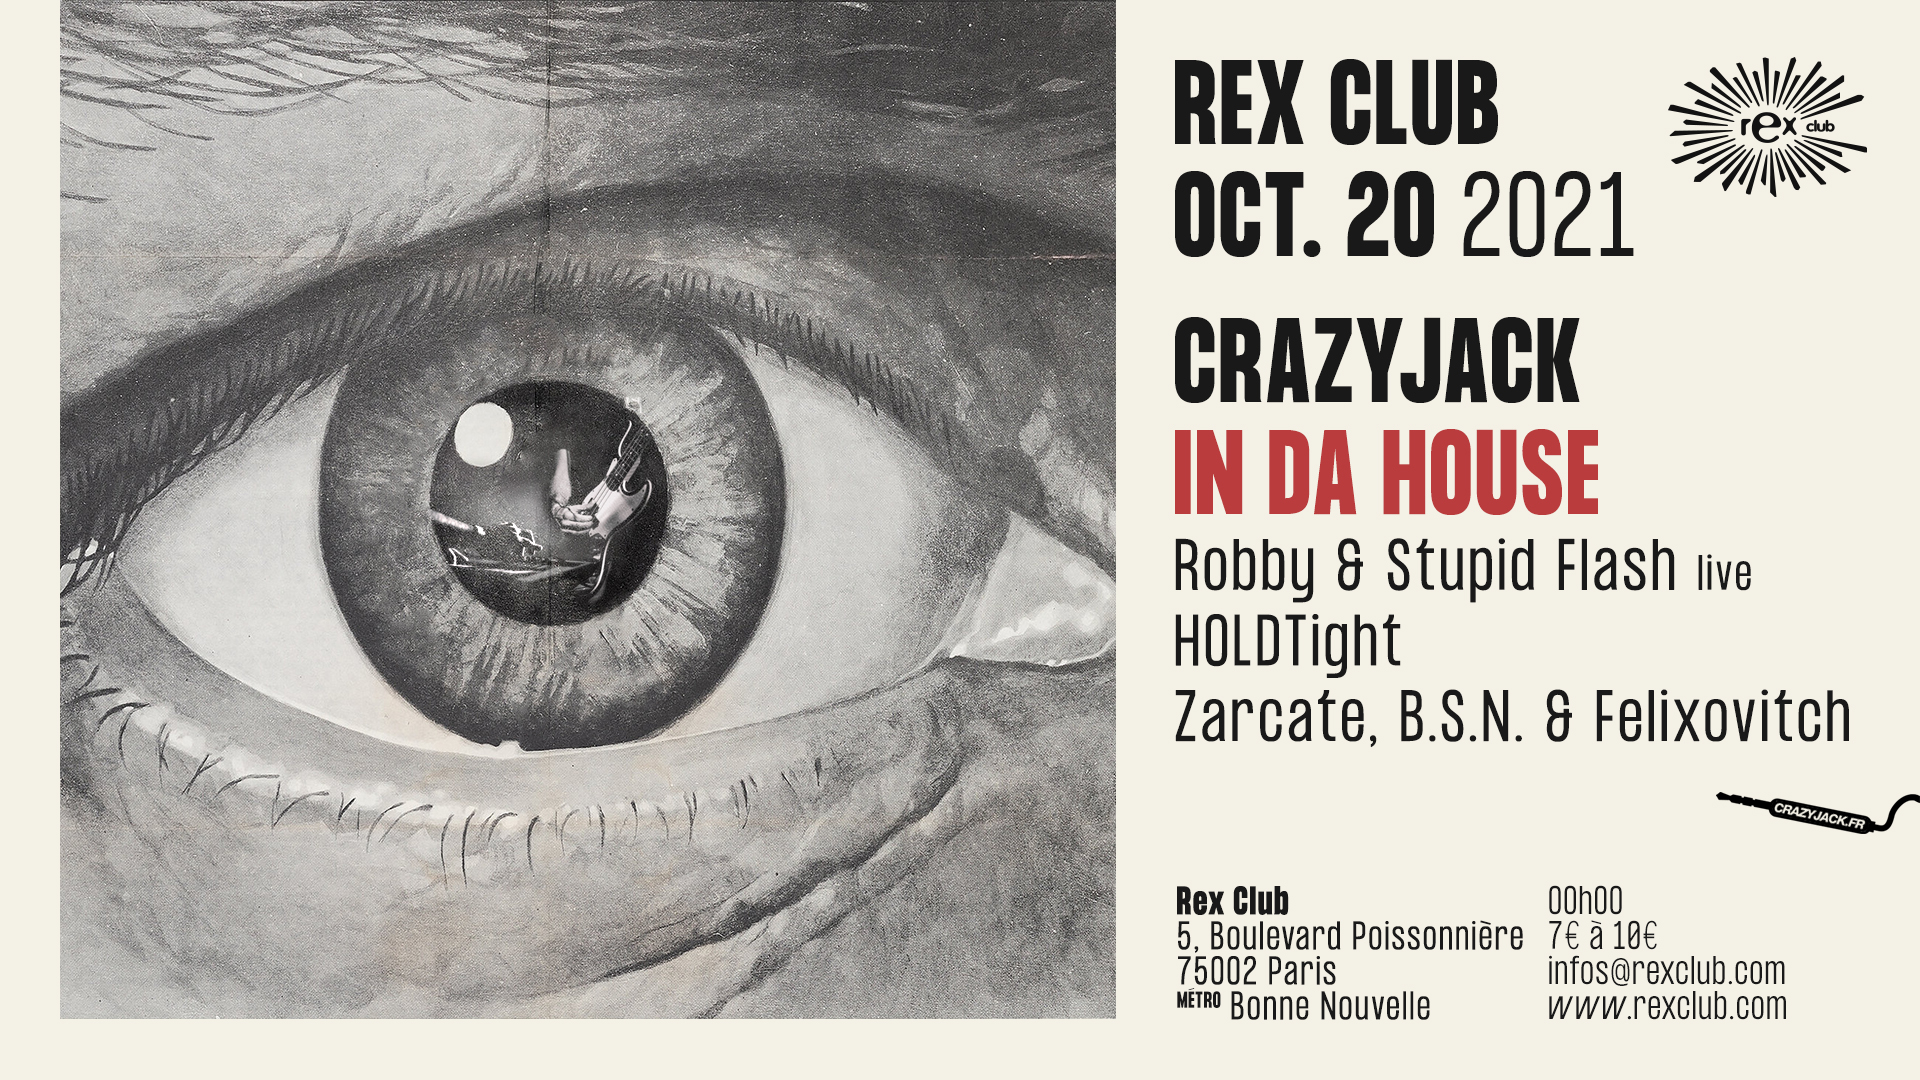 CrazyJack in da House : Robby & Stupid Flash live, Holdtight & more